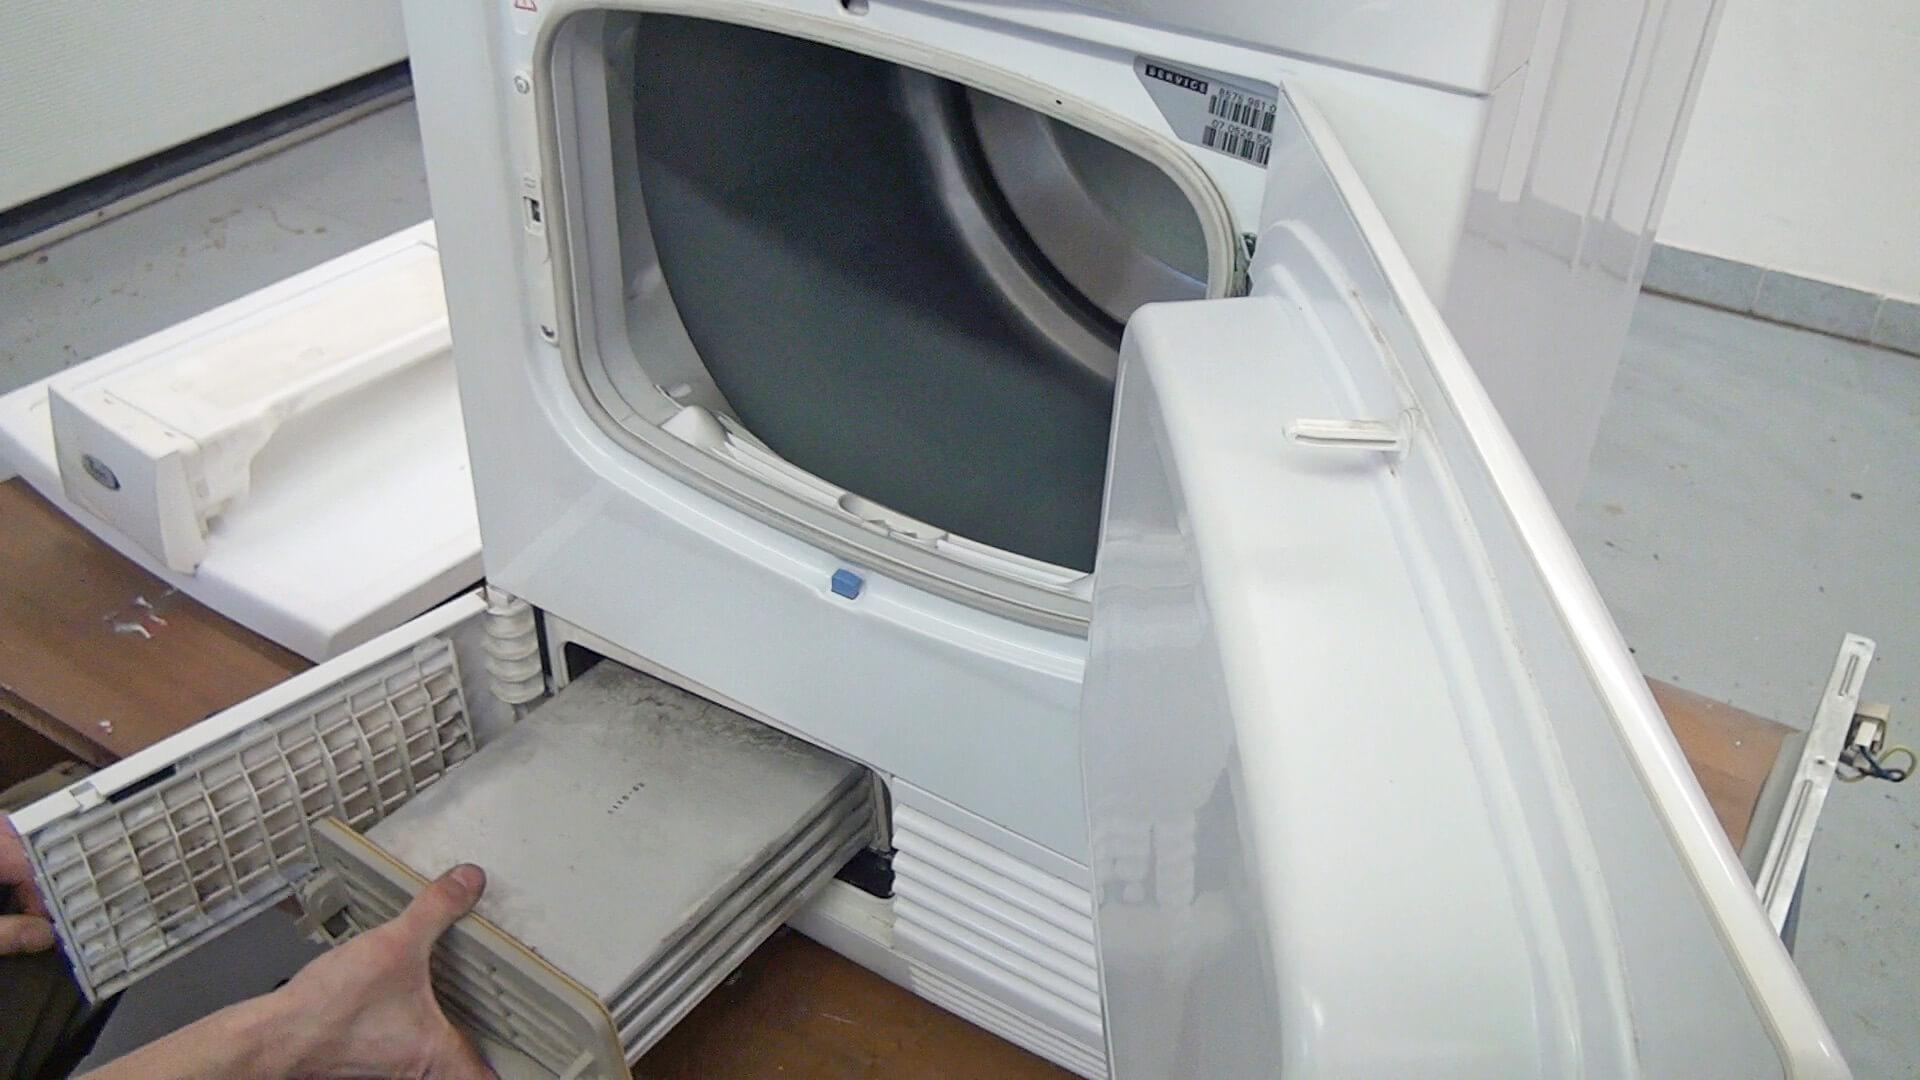 Kondensator entfernen